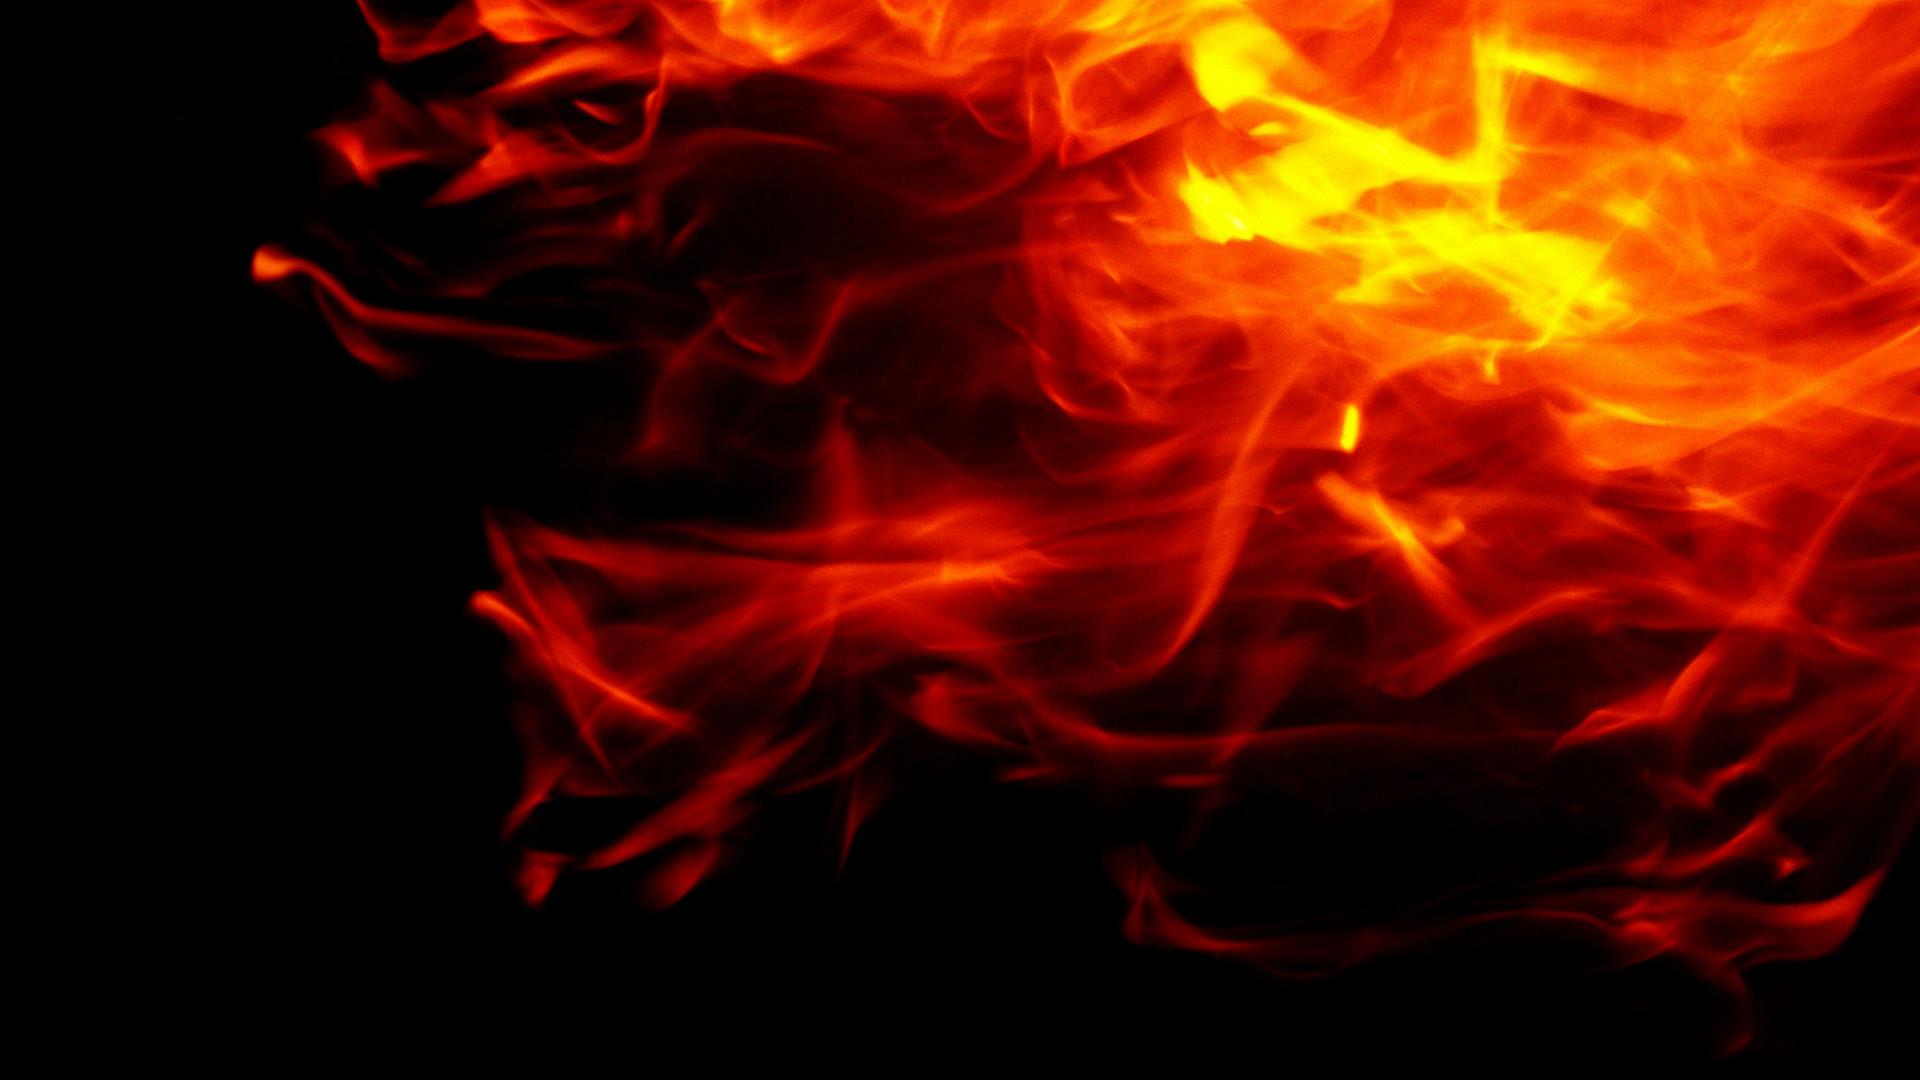 Red Flames 1920x1080p HD Fire Wallpaper